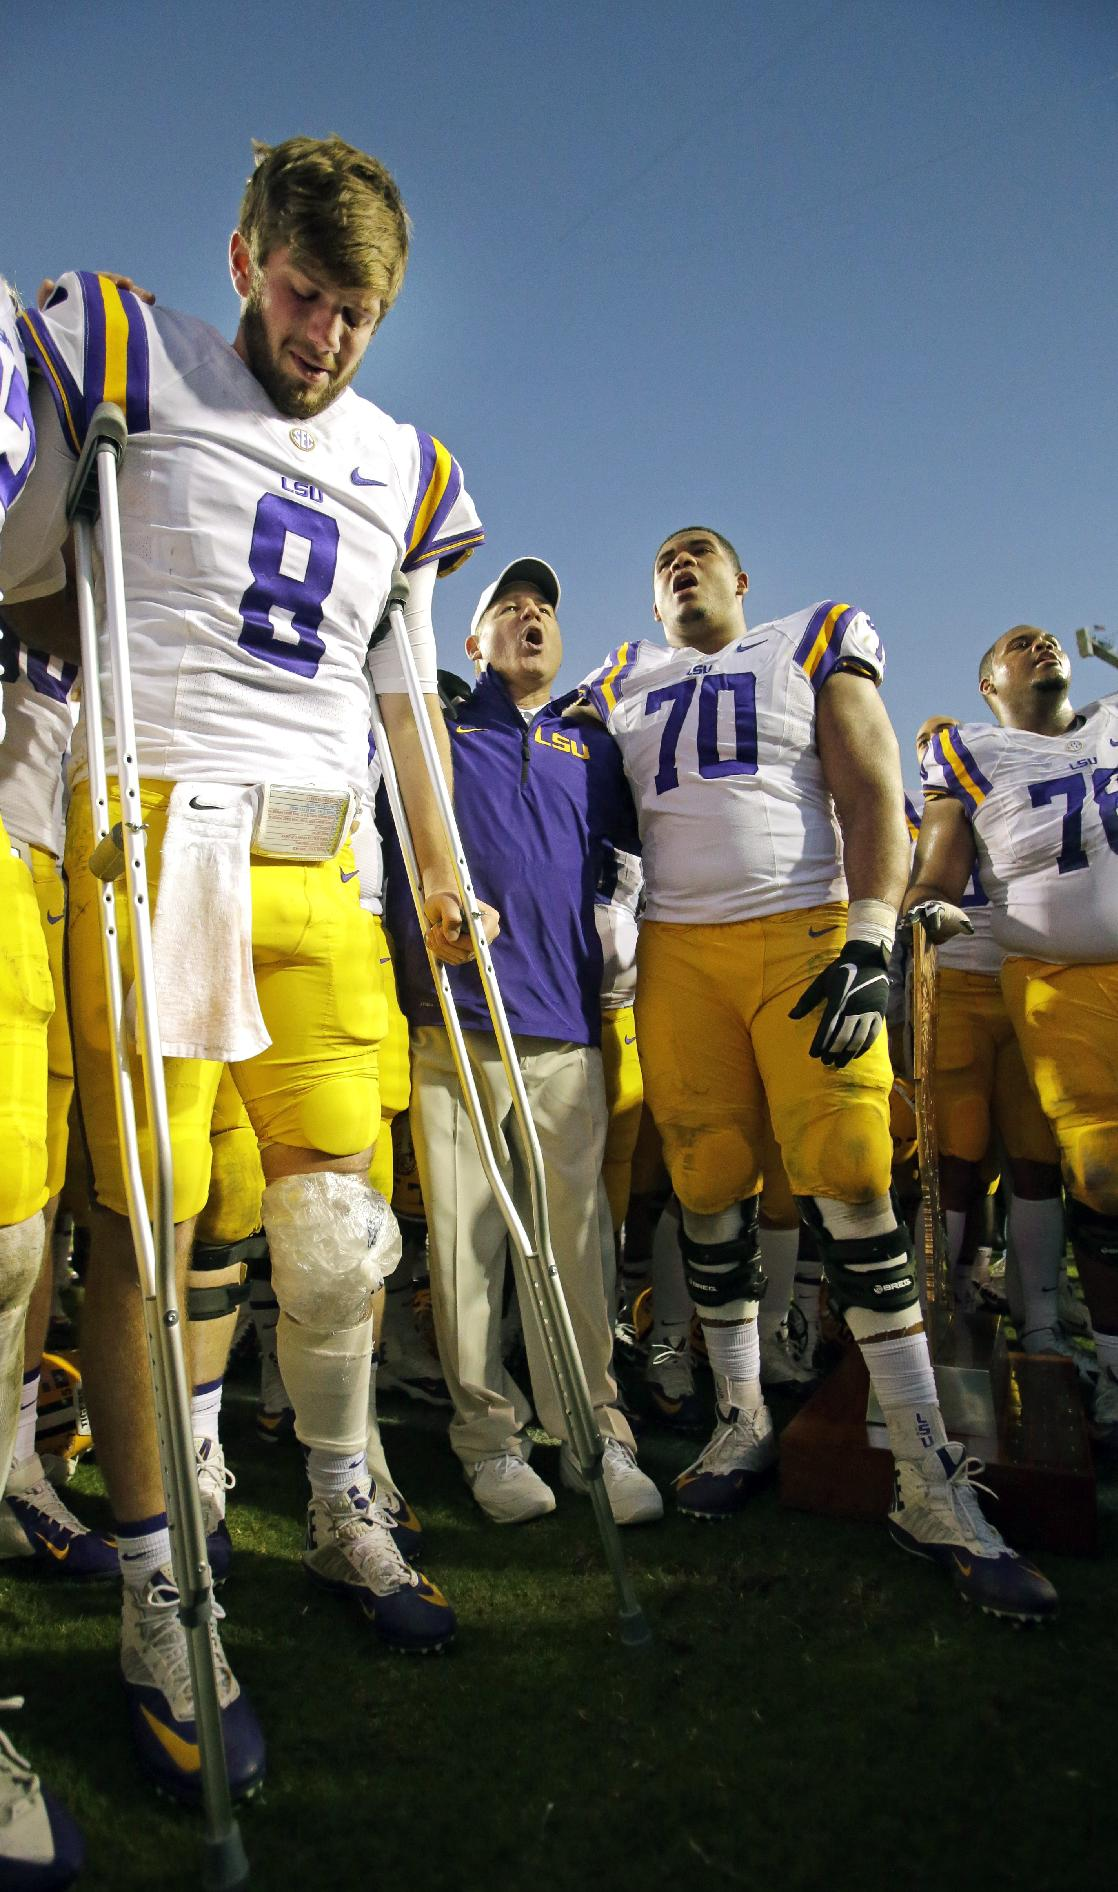 Mettenberger's LSU career ends with knee injury